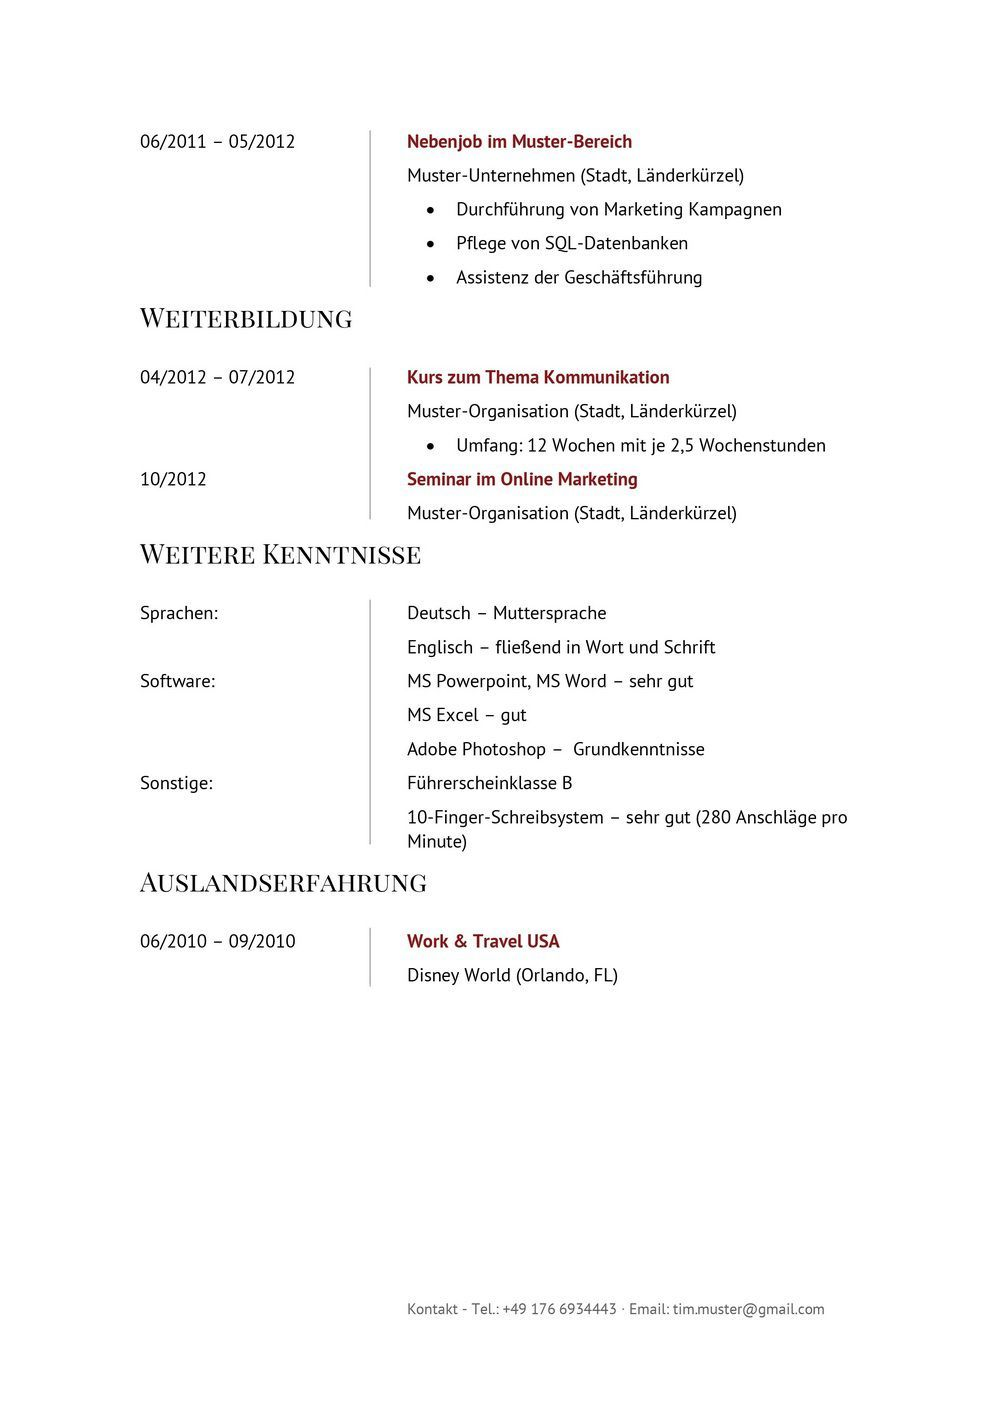 Lebenslauf Muster Vorlage Manager 2 | Lebenslauf | Pinterest ...